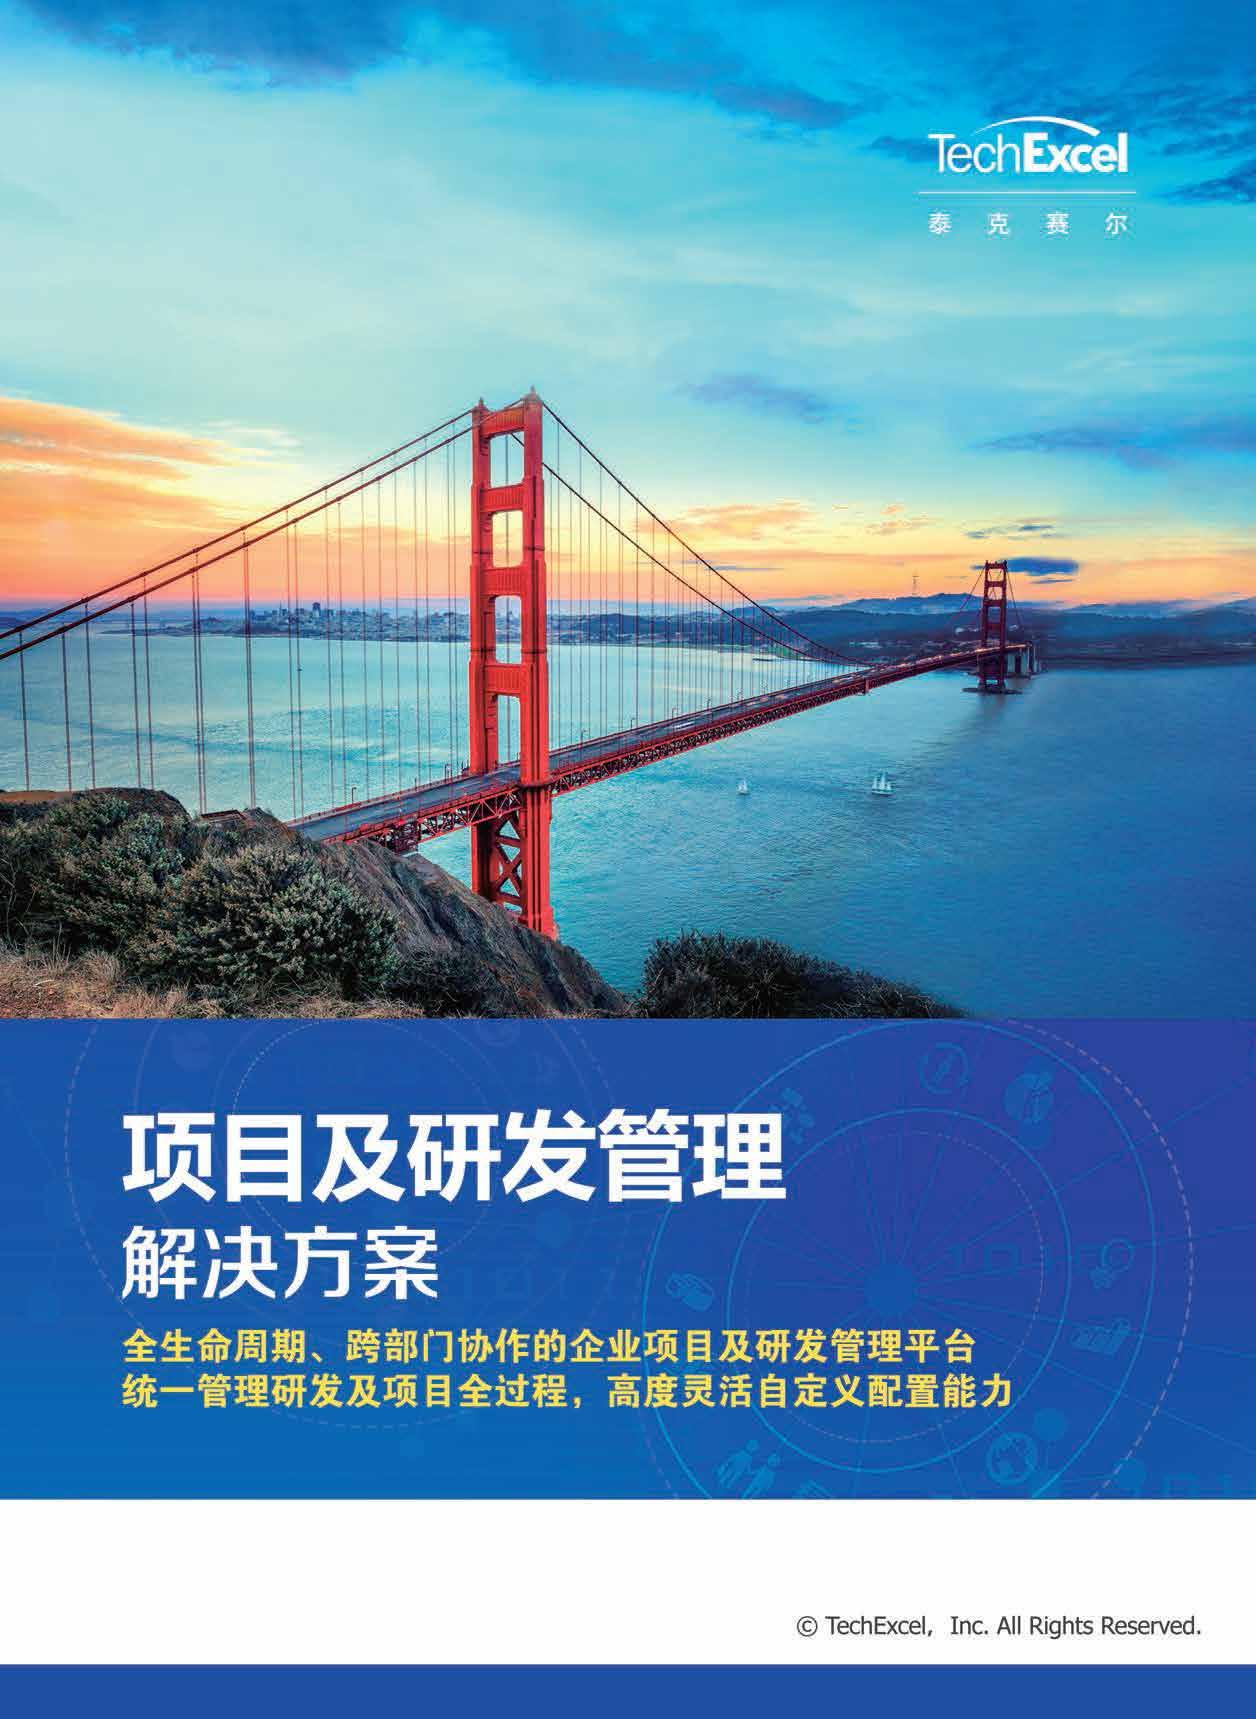 TechExcel-项目及研发管理解决方案